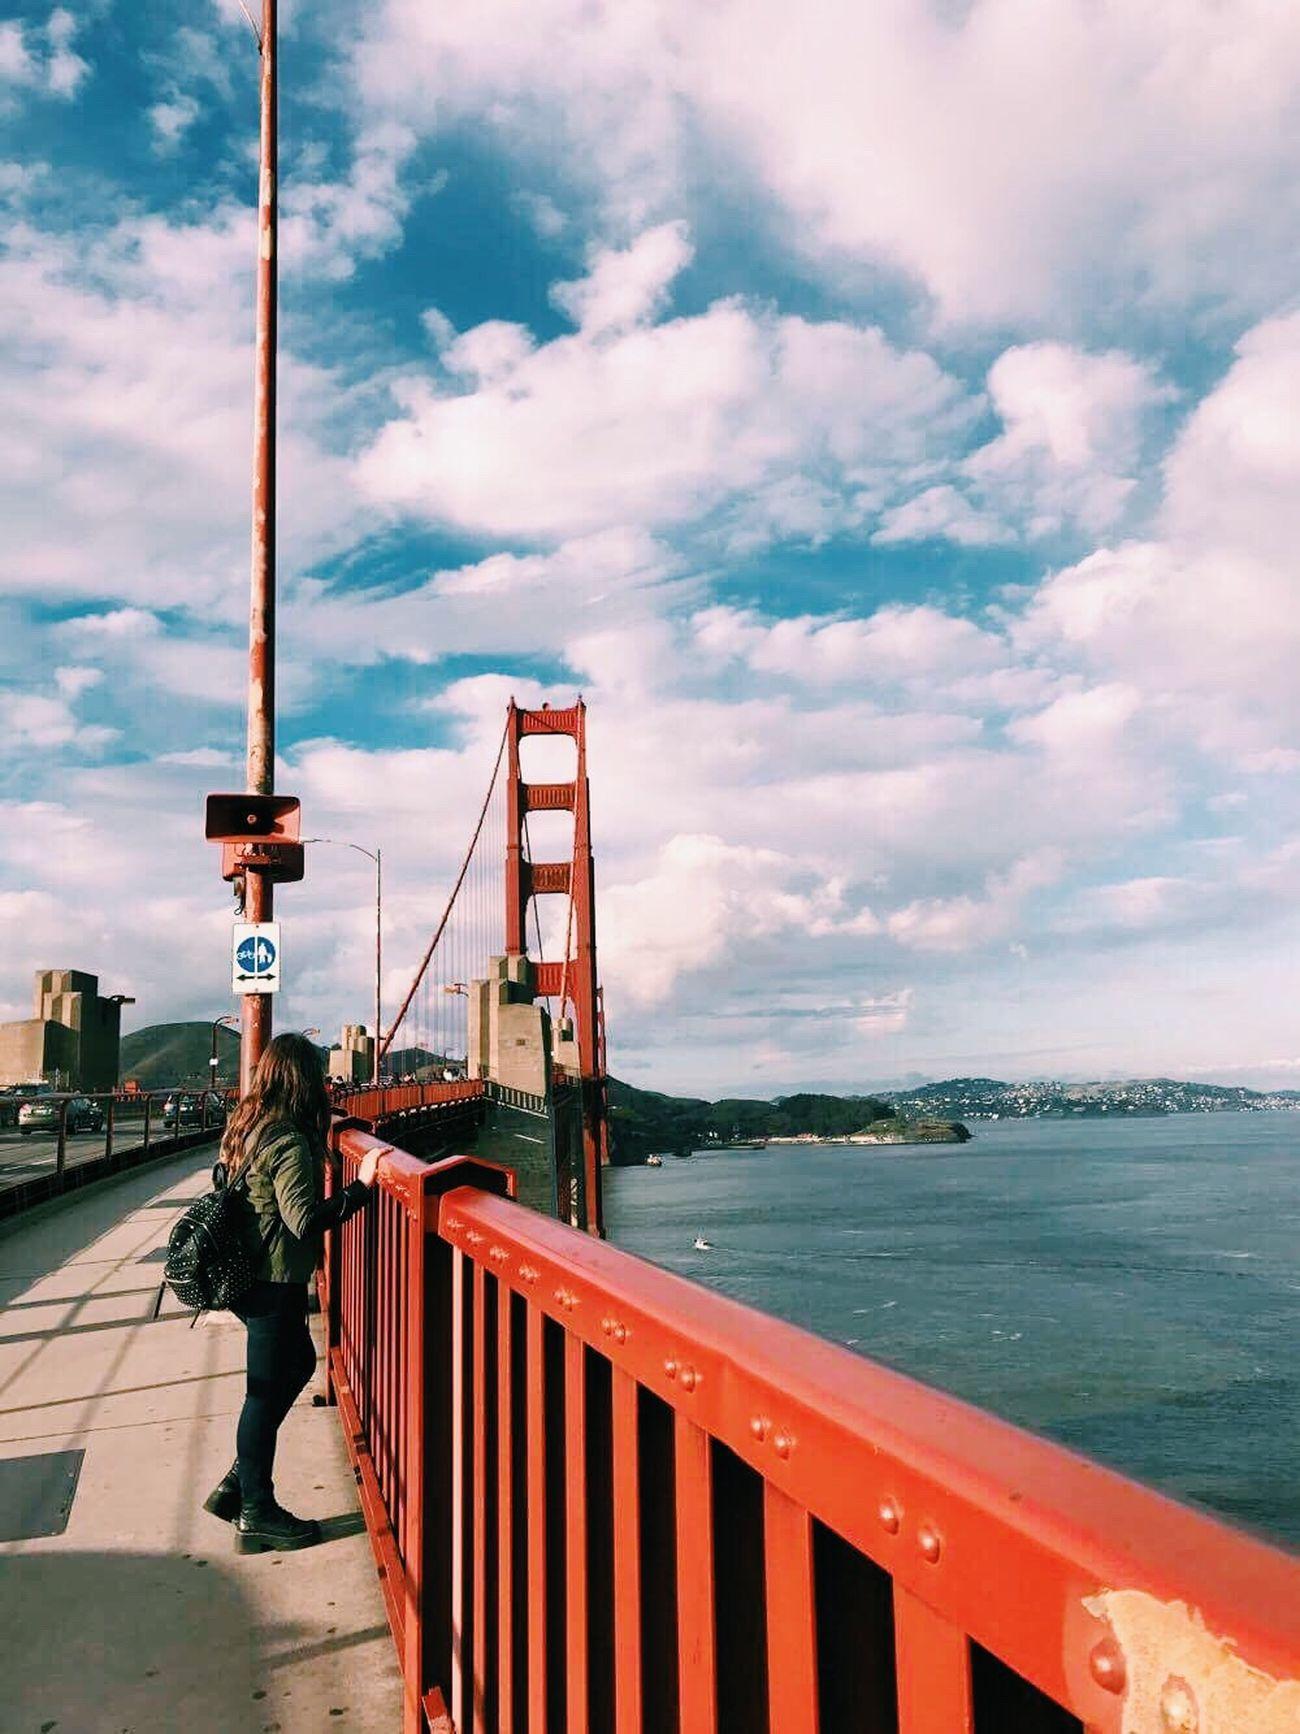 Sky Water Outdoors Architecture Bridge - Man Made Structure Sea Golden Gate Bridge San Francisco California USA Roadtrip Brunette